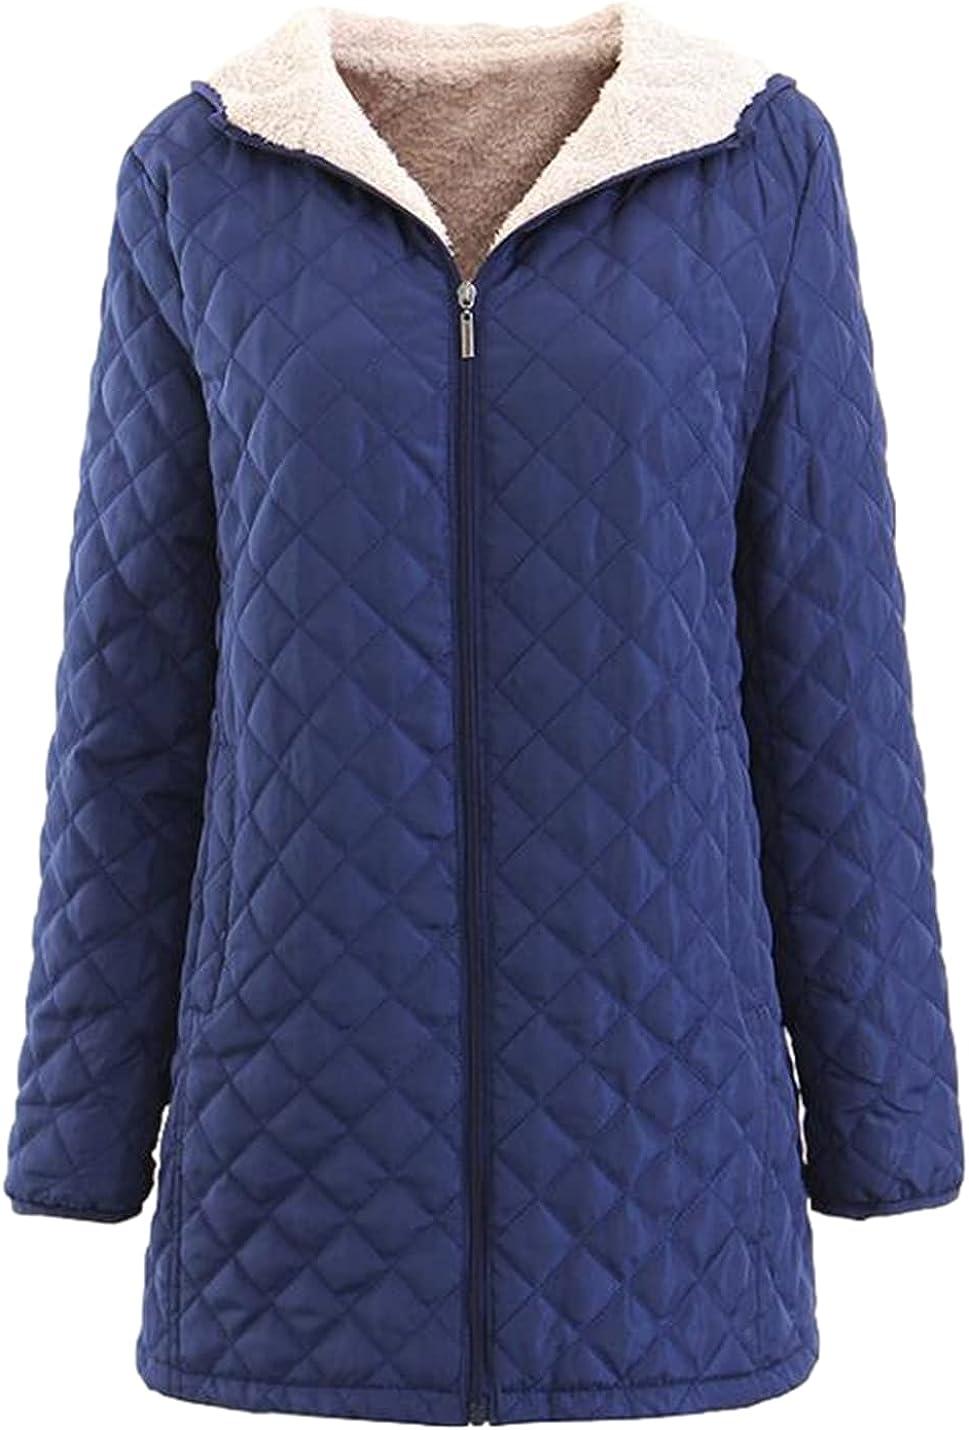 Xishiloft Women's Fleece Many popular brands Cotton Jacket Zipper Max 72% OFF Long Sleeve Hooded